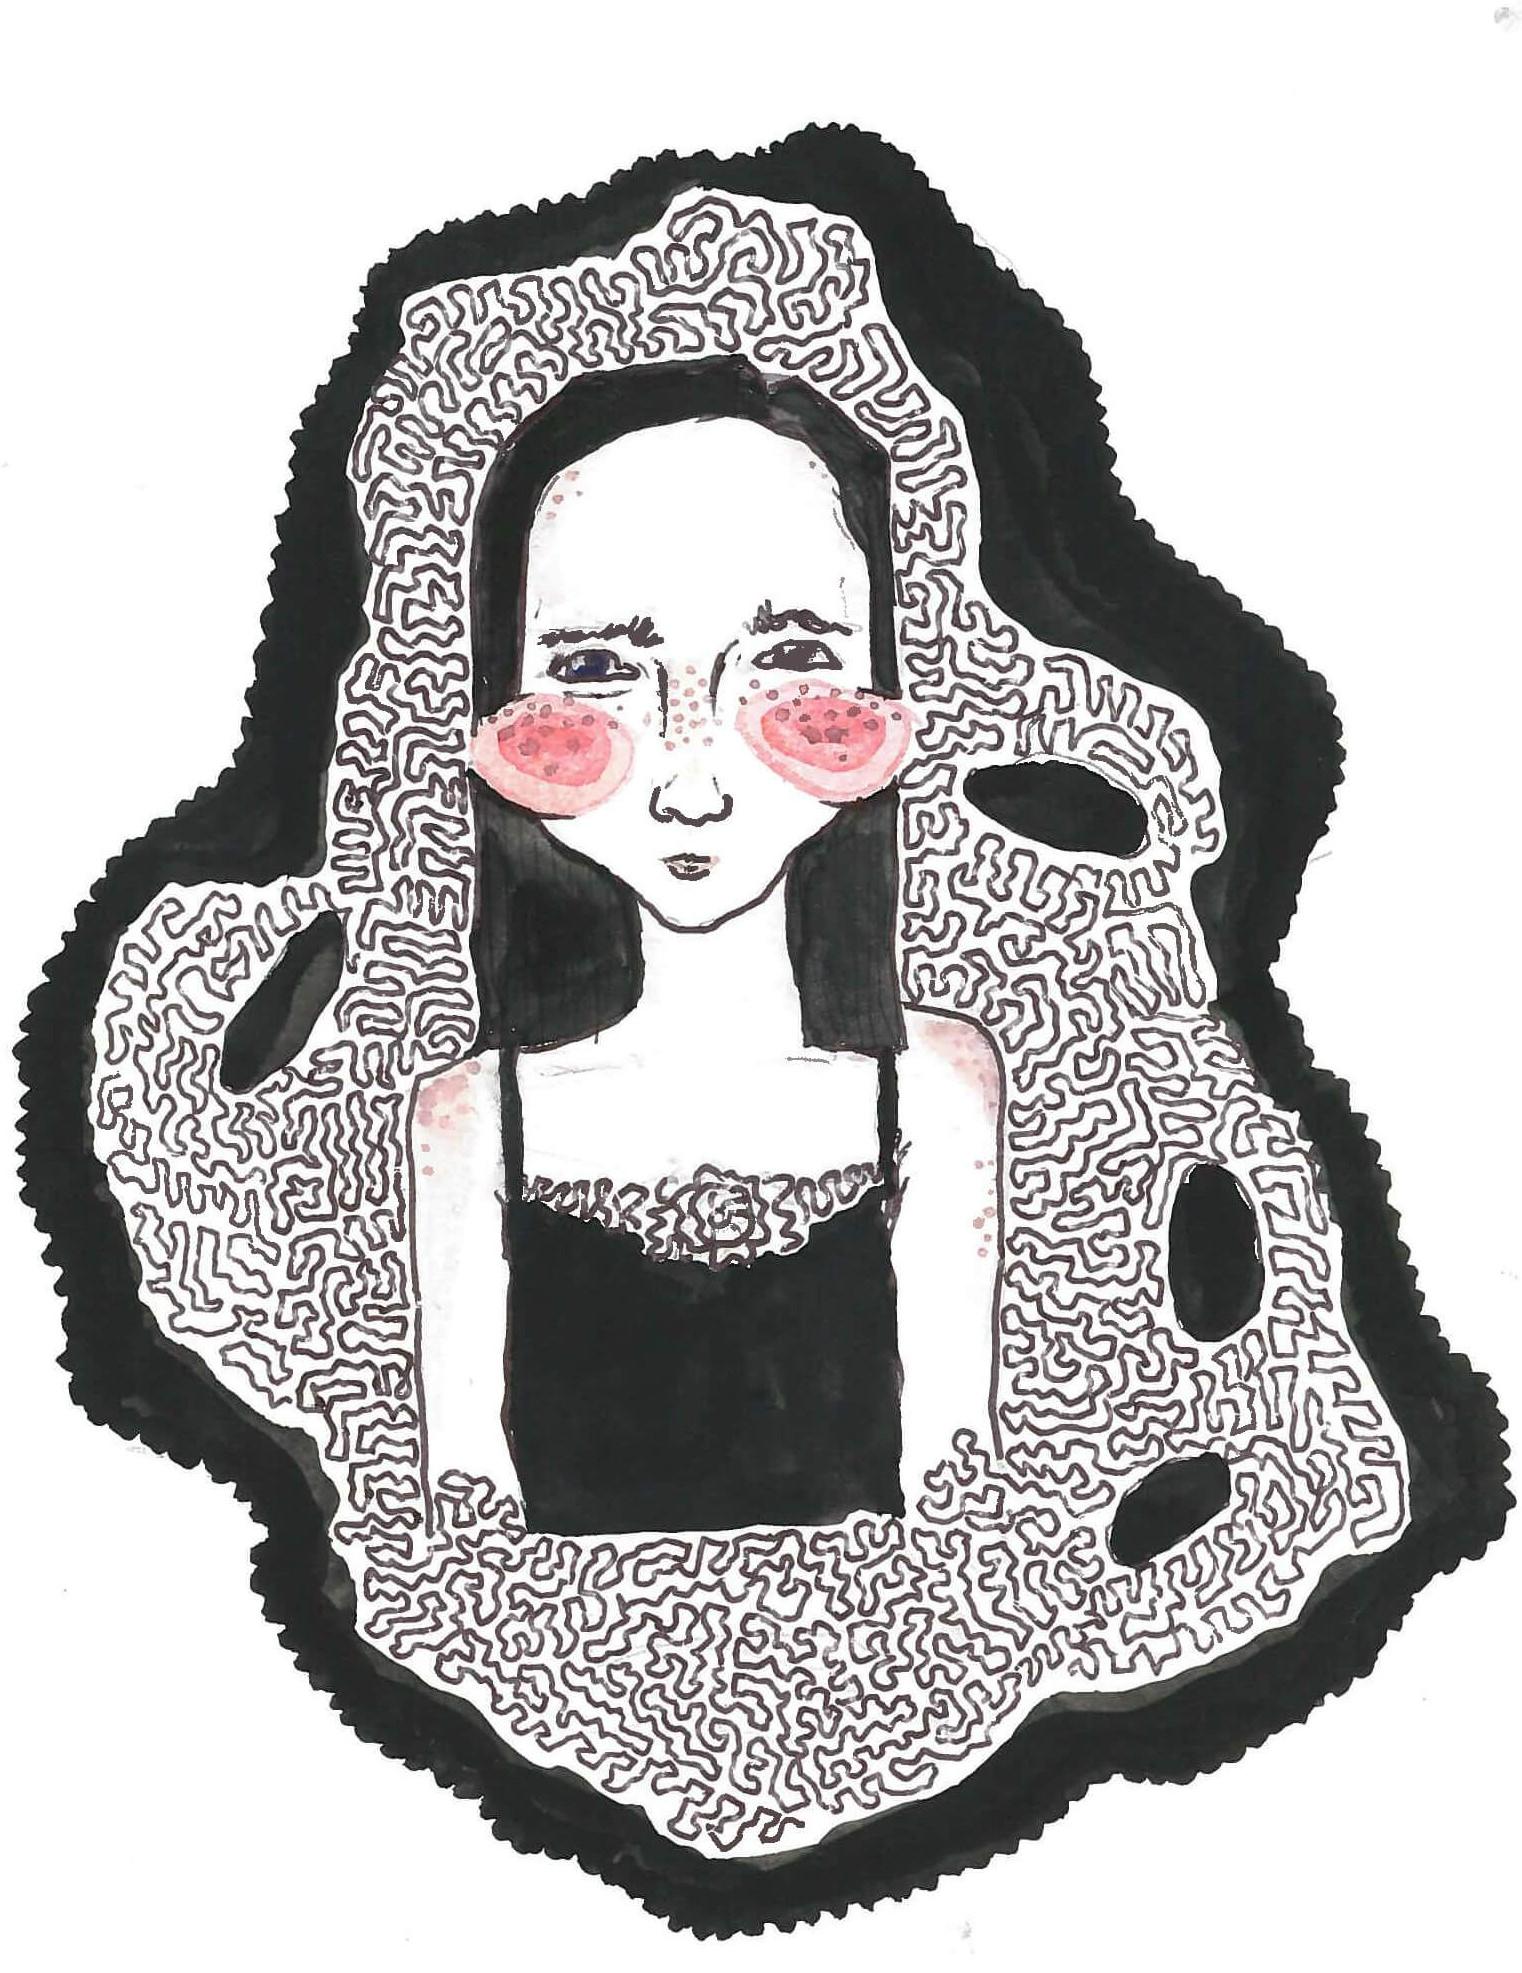 DISCONNECTED. —Ella